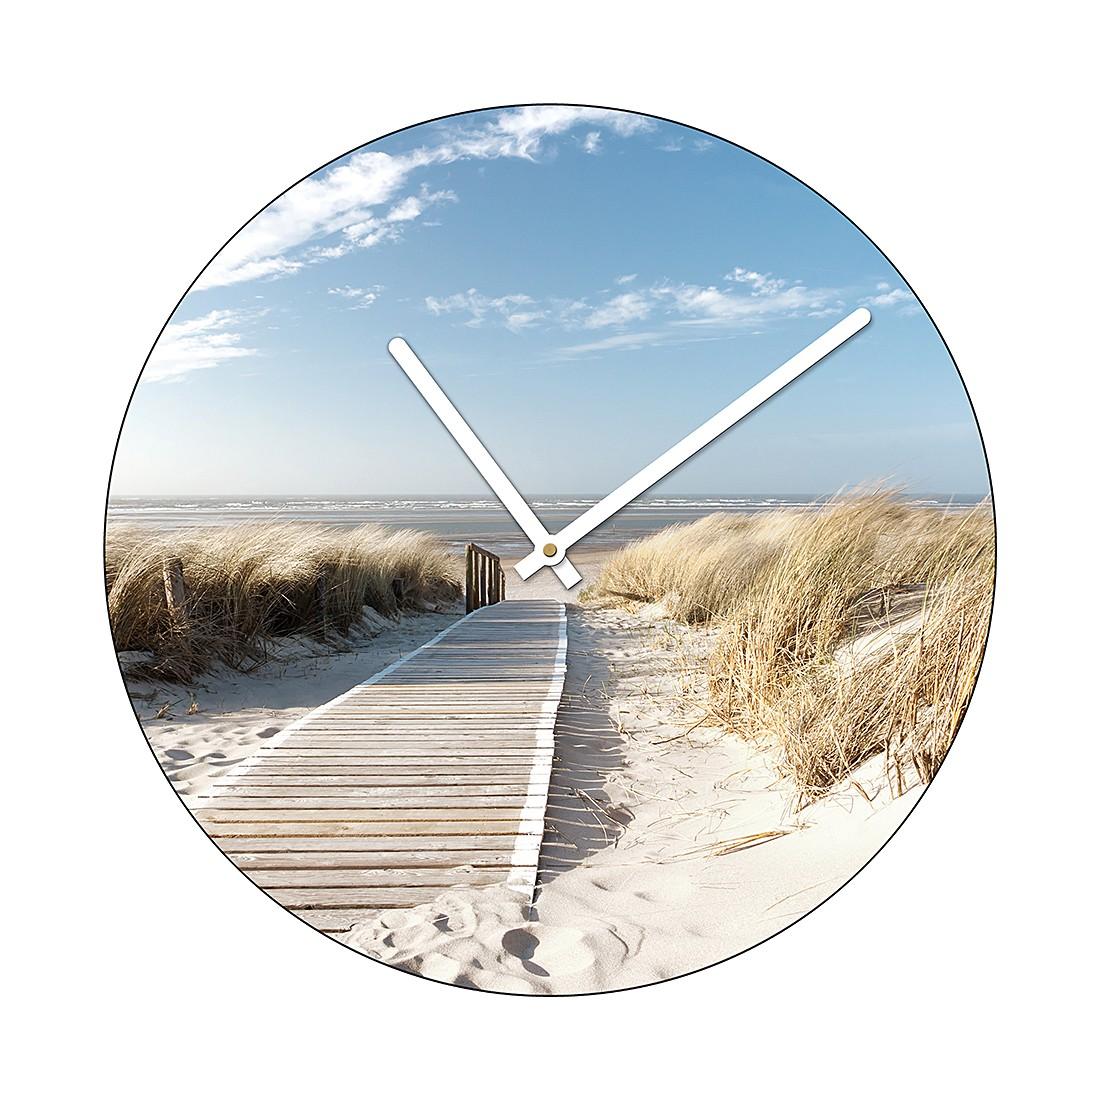 Image of Orologio da parete Vista marina III, Pro Art